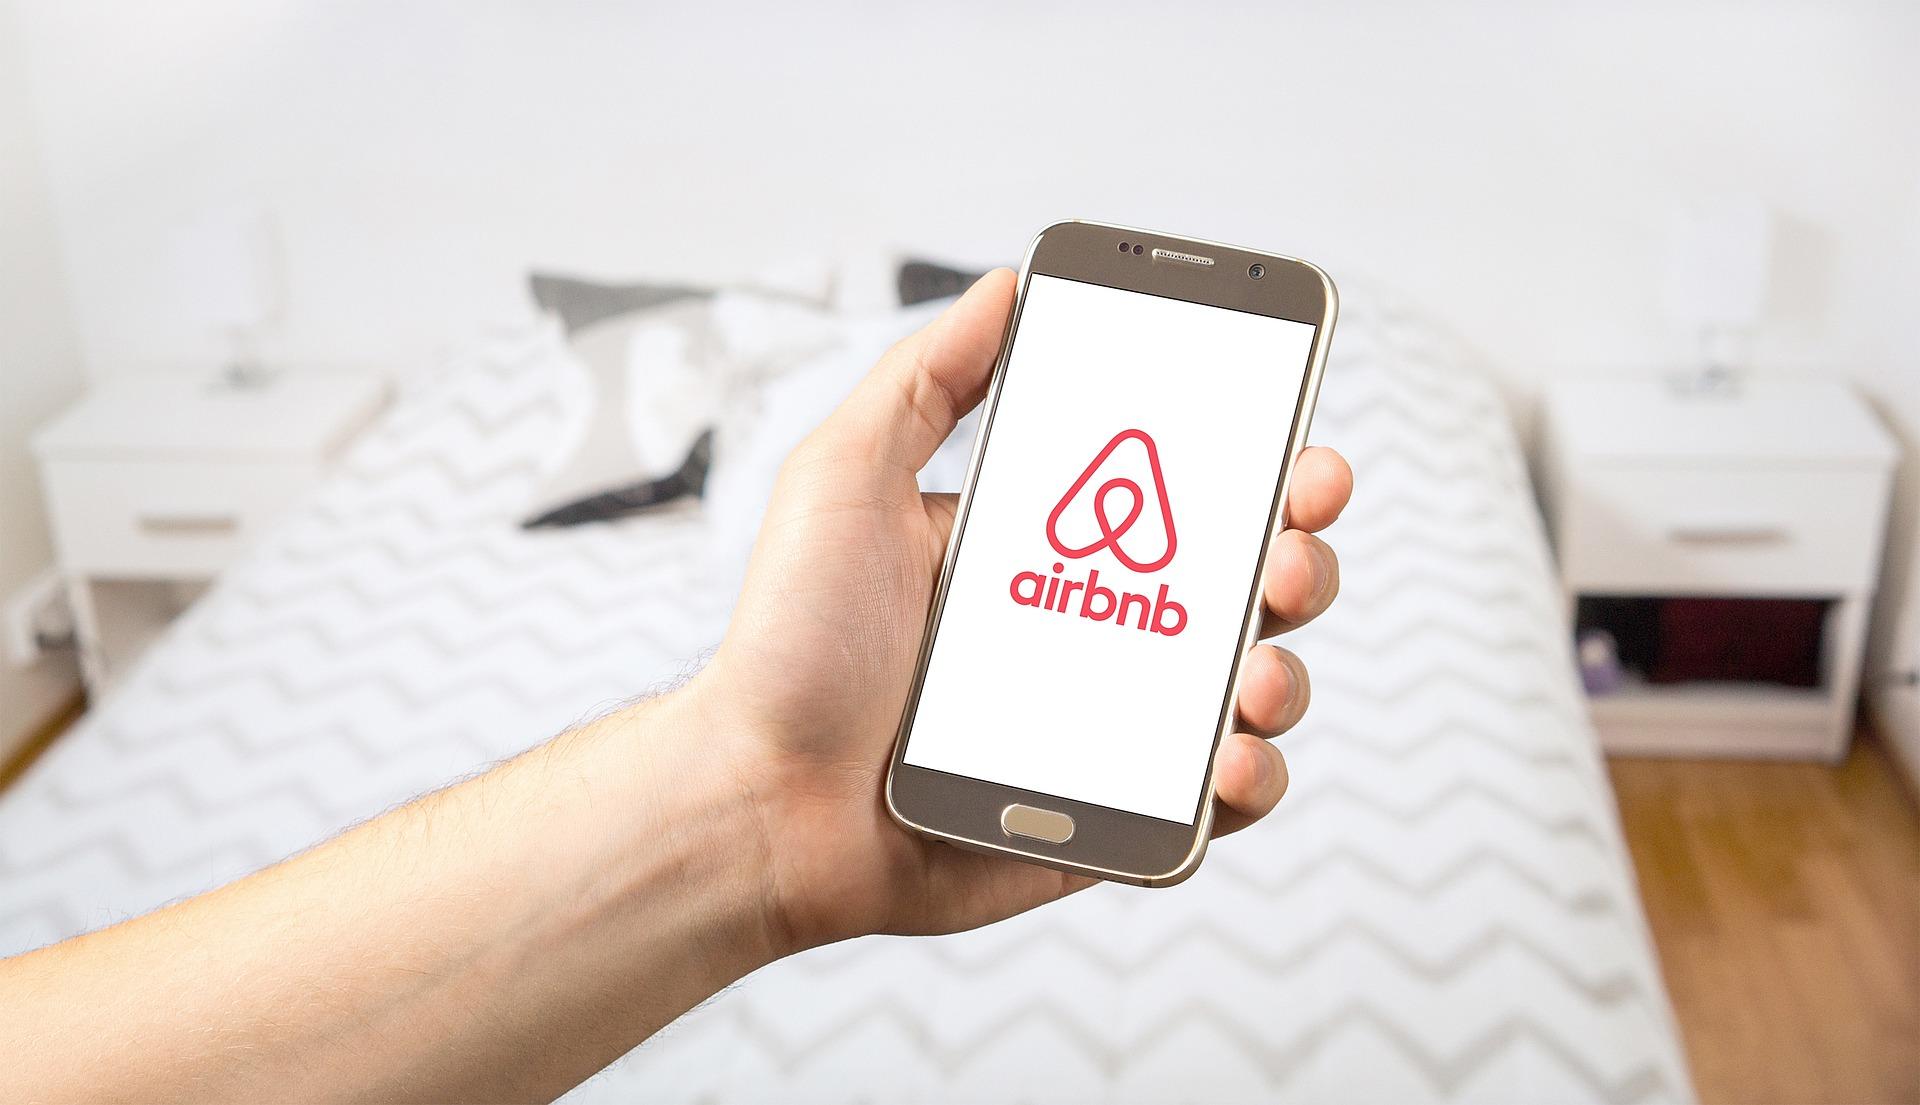 Airbnb en Brasil es confiable